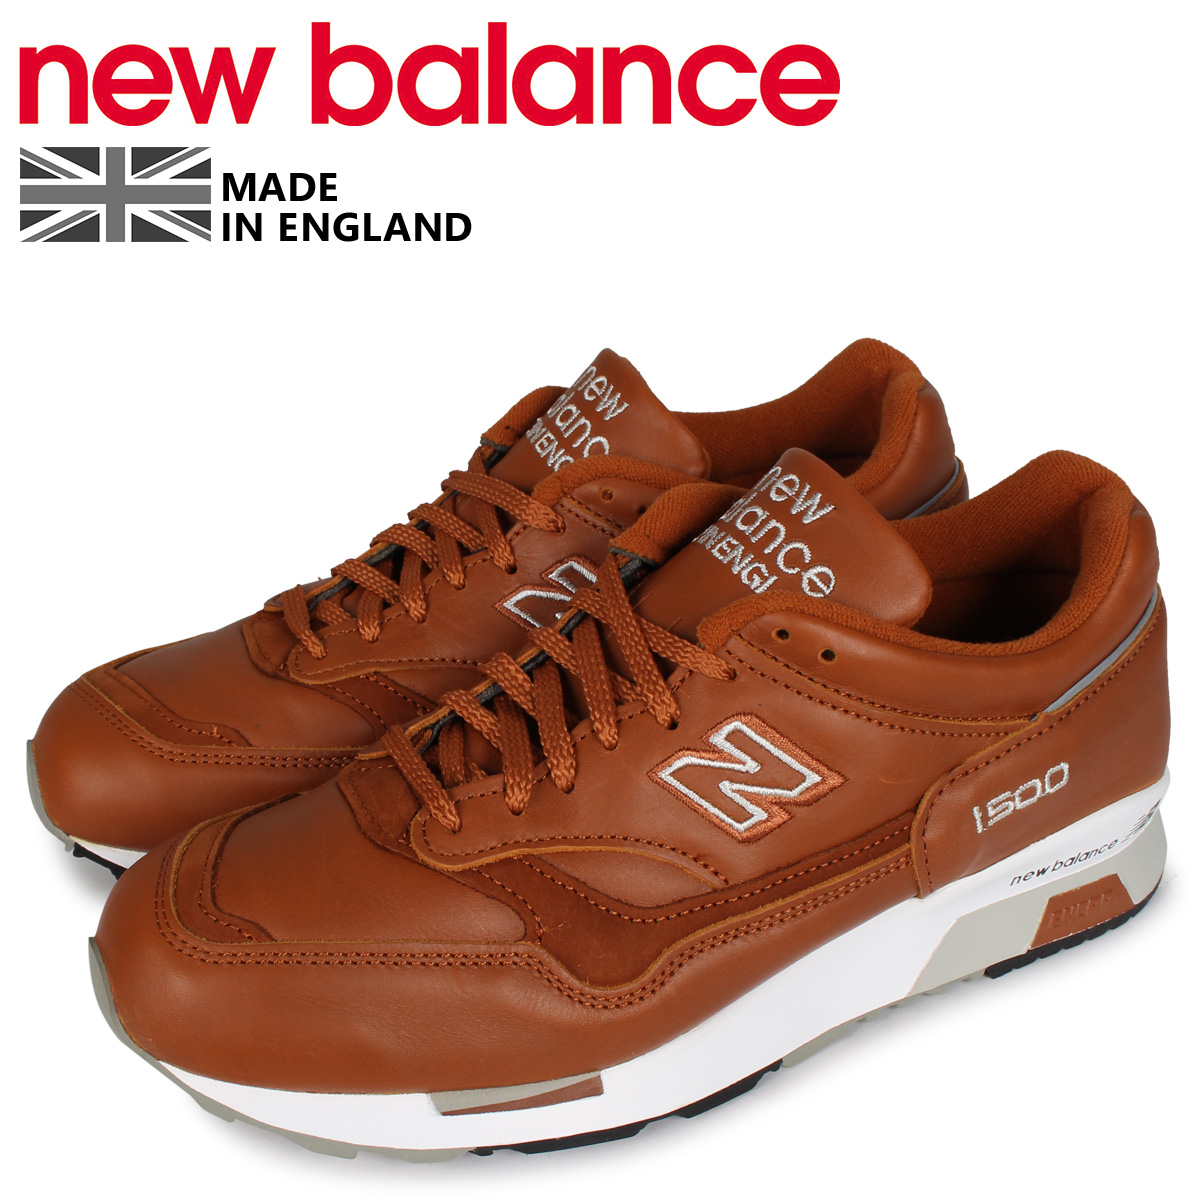 new balance 1500 tn